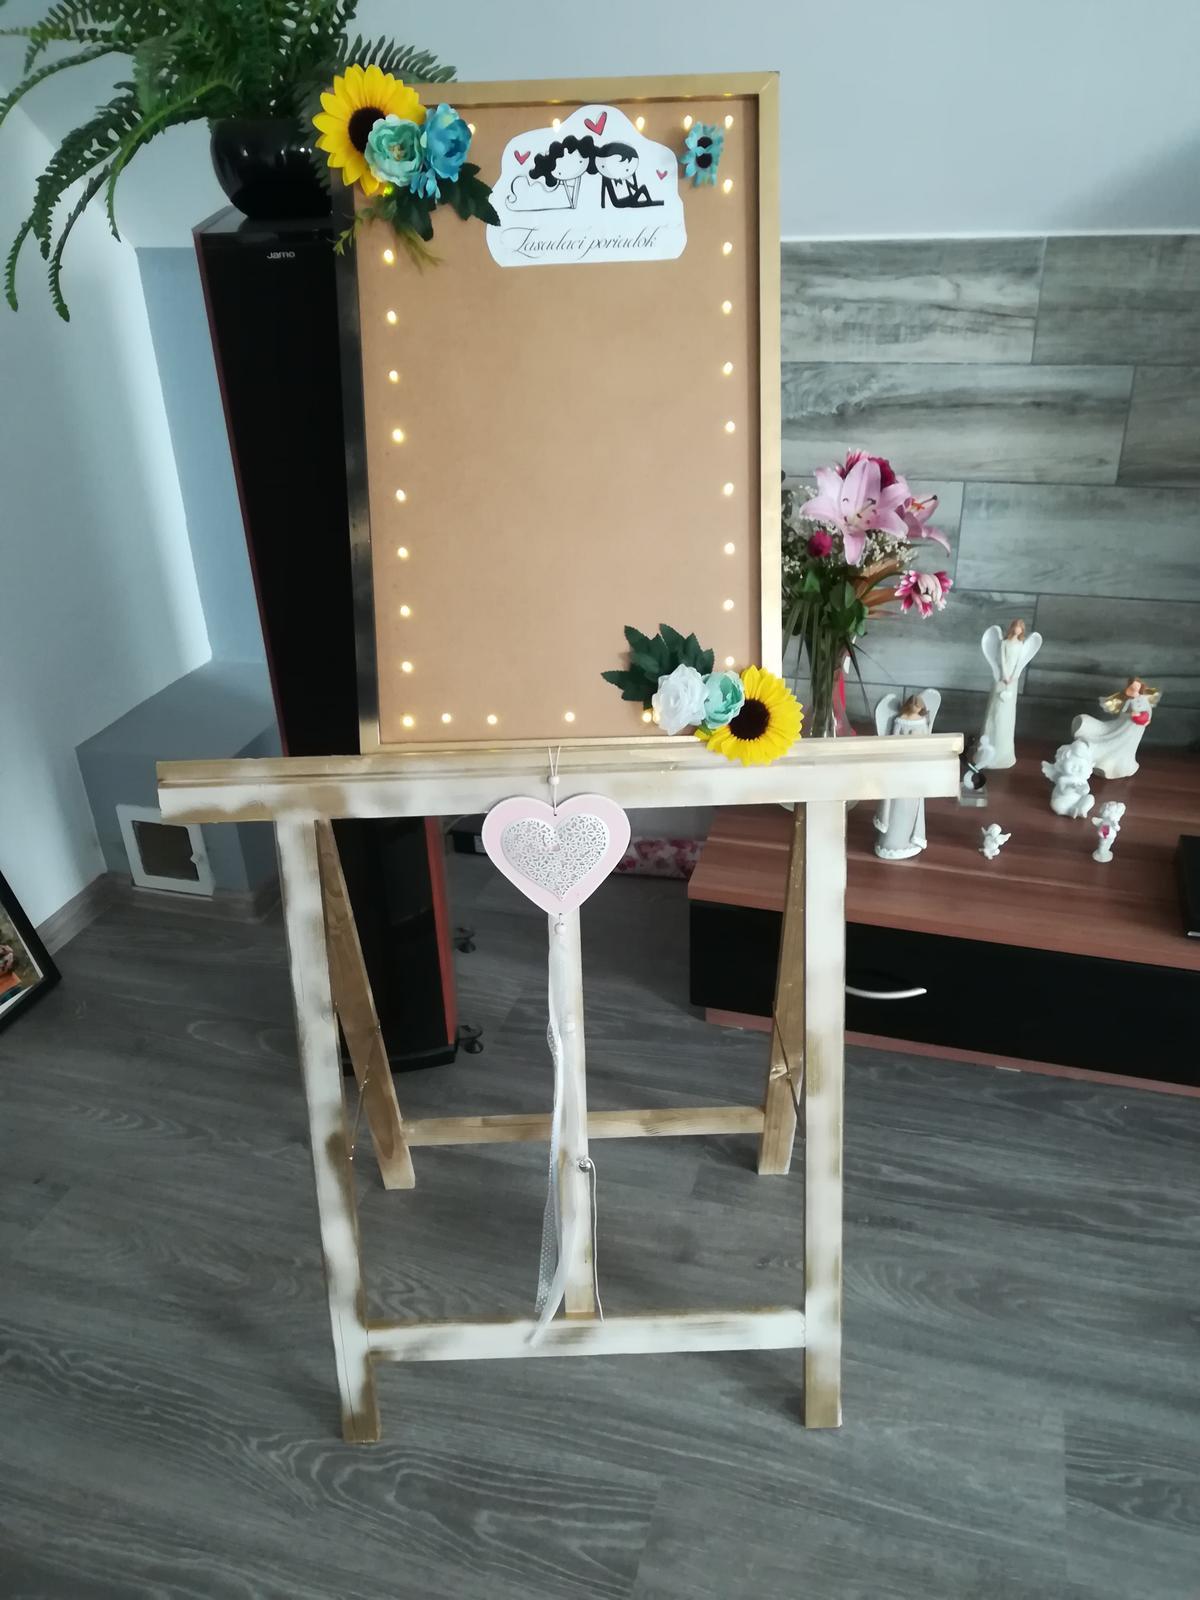 Moja handmade svadba - Obrázok č. 3